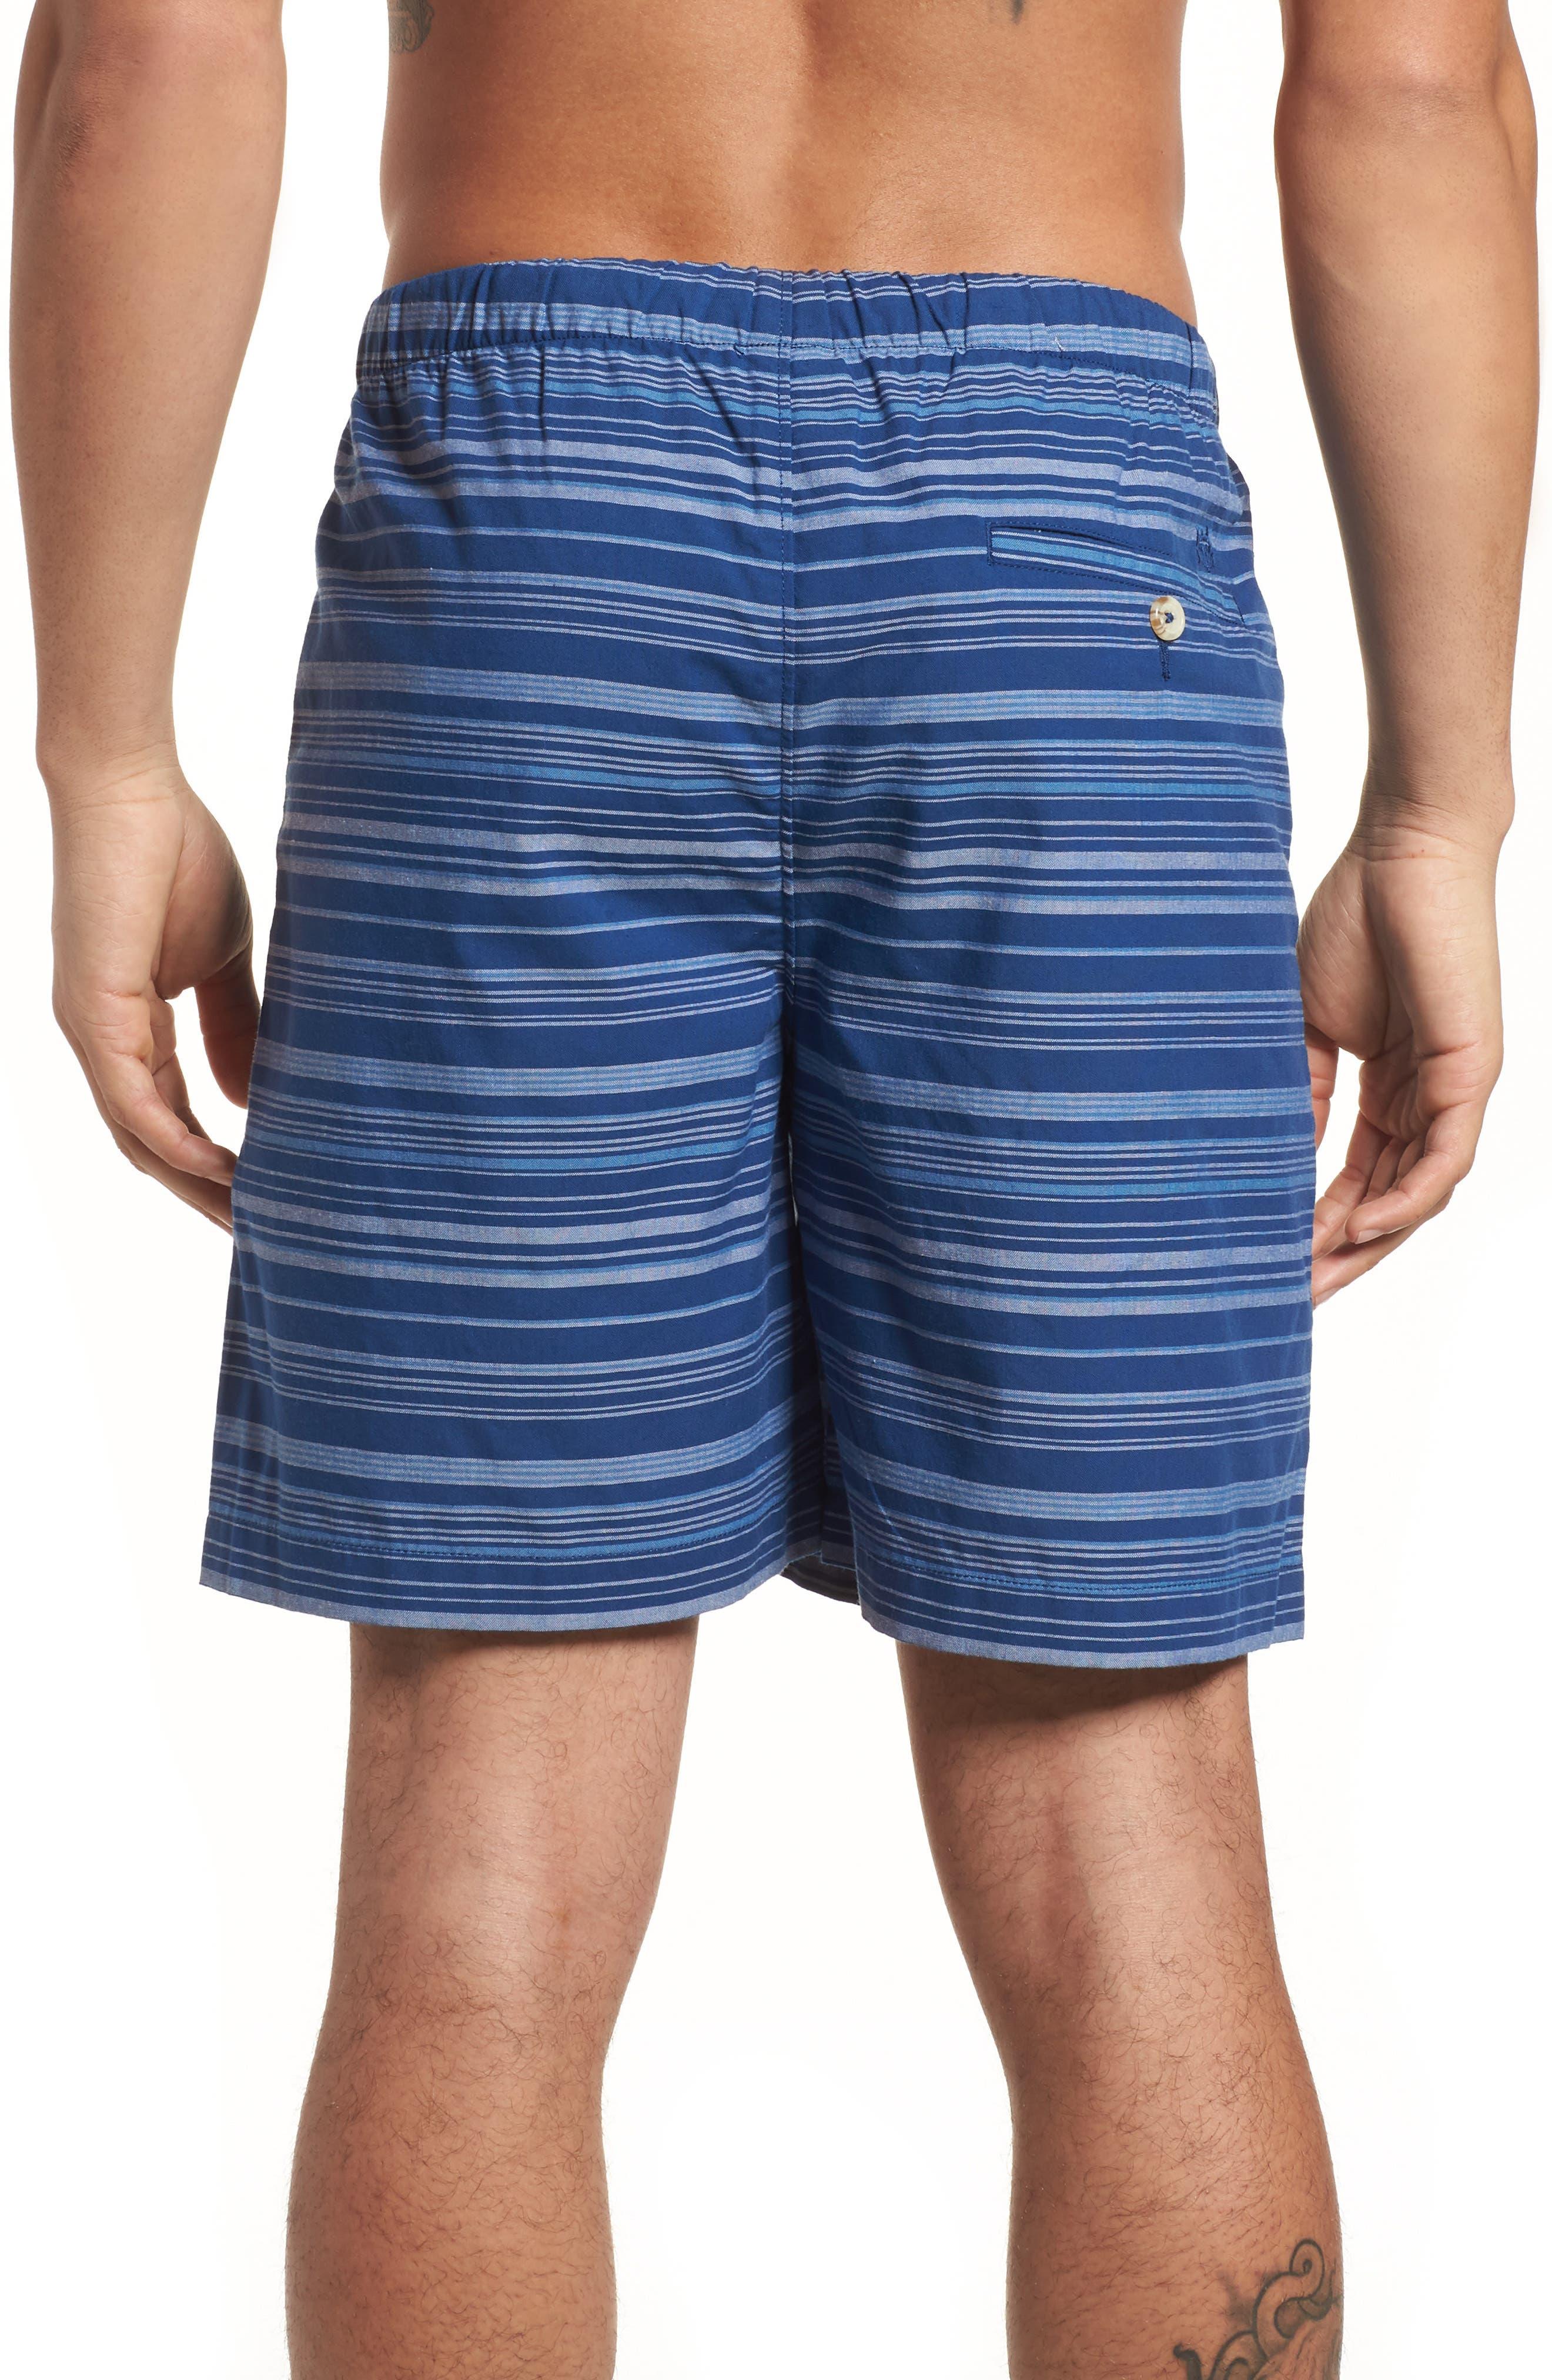 Hammock Board Shorts,                             Alternate thumbnail 2, color,                             Seven Seas Blue